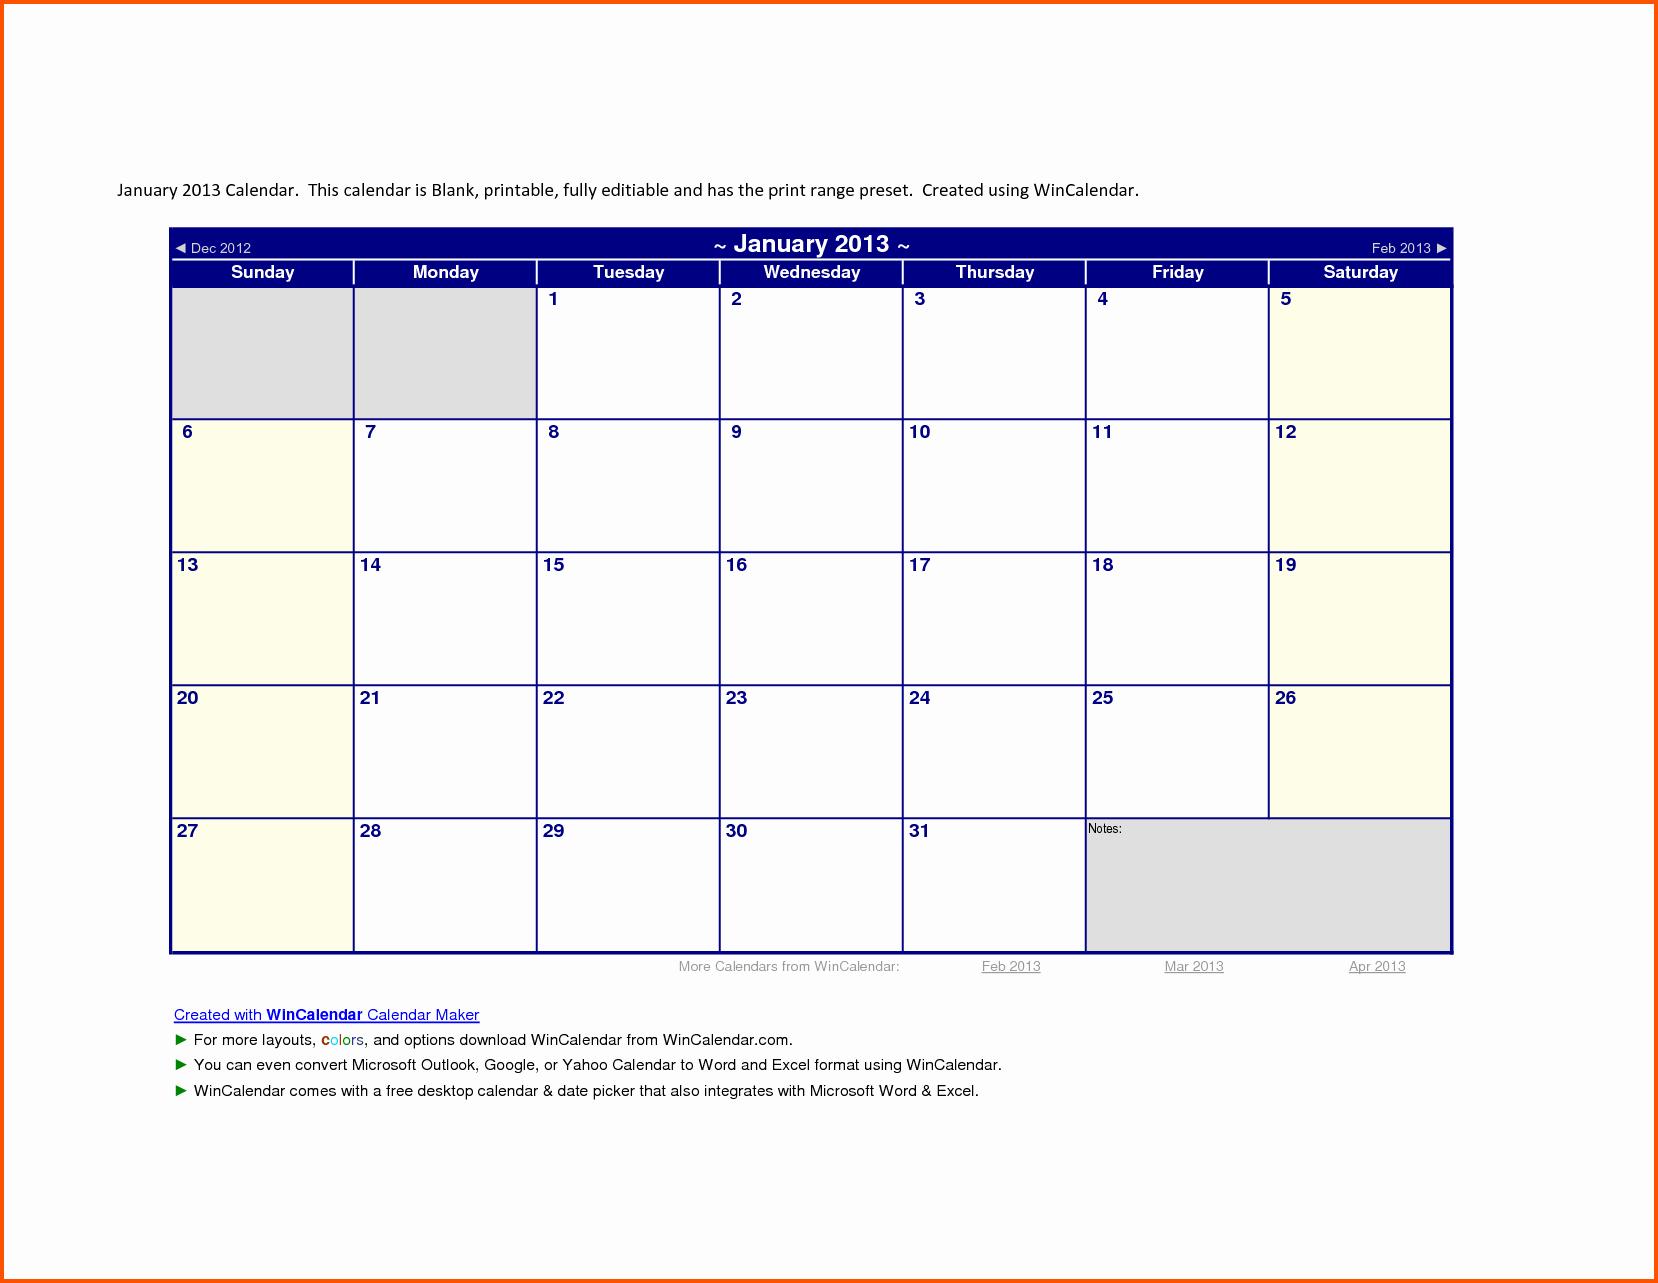 Calendar Templates for Ms Word Best Of 2013 Calendar Template Word